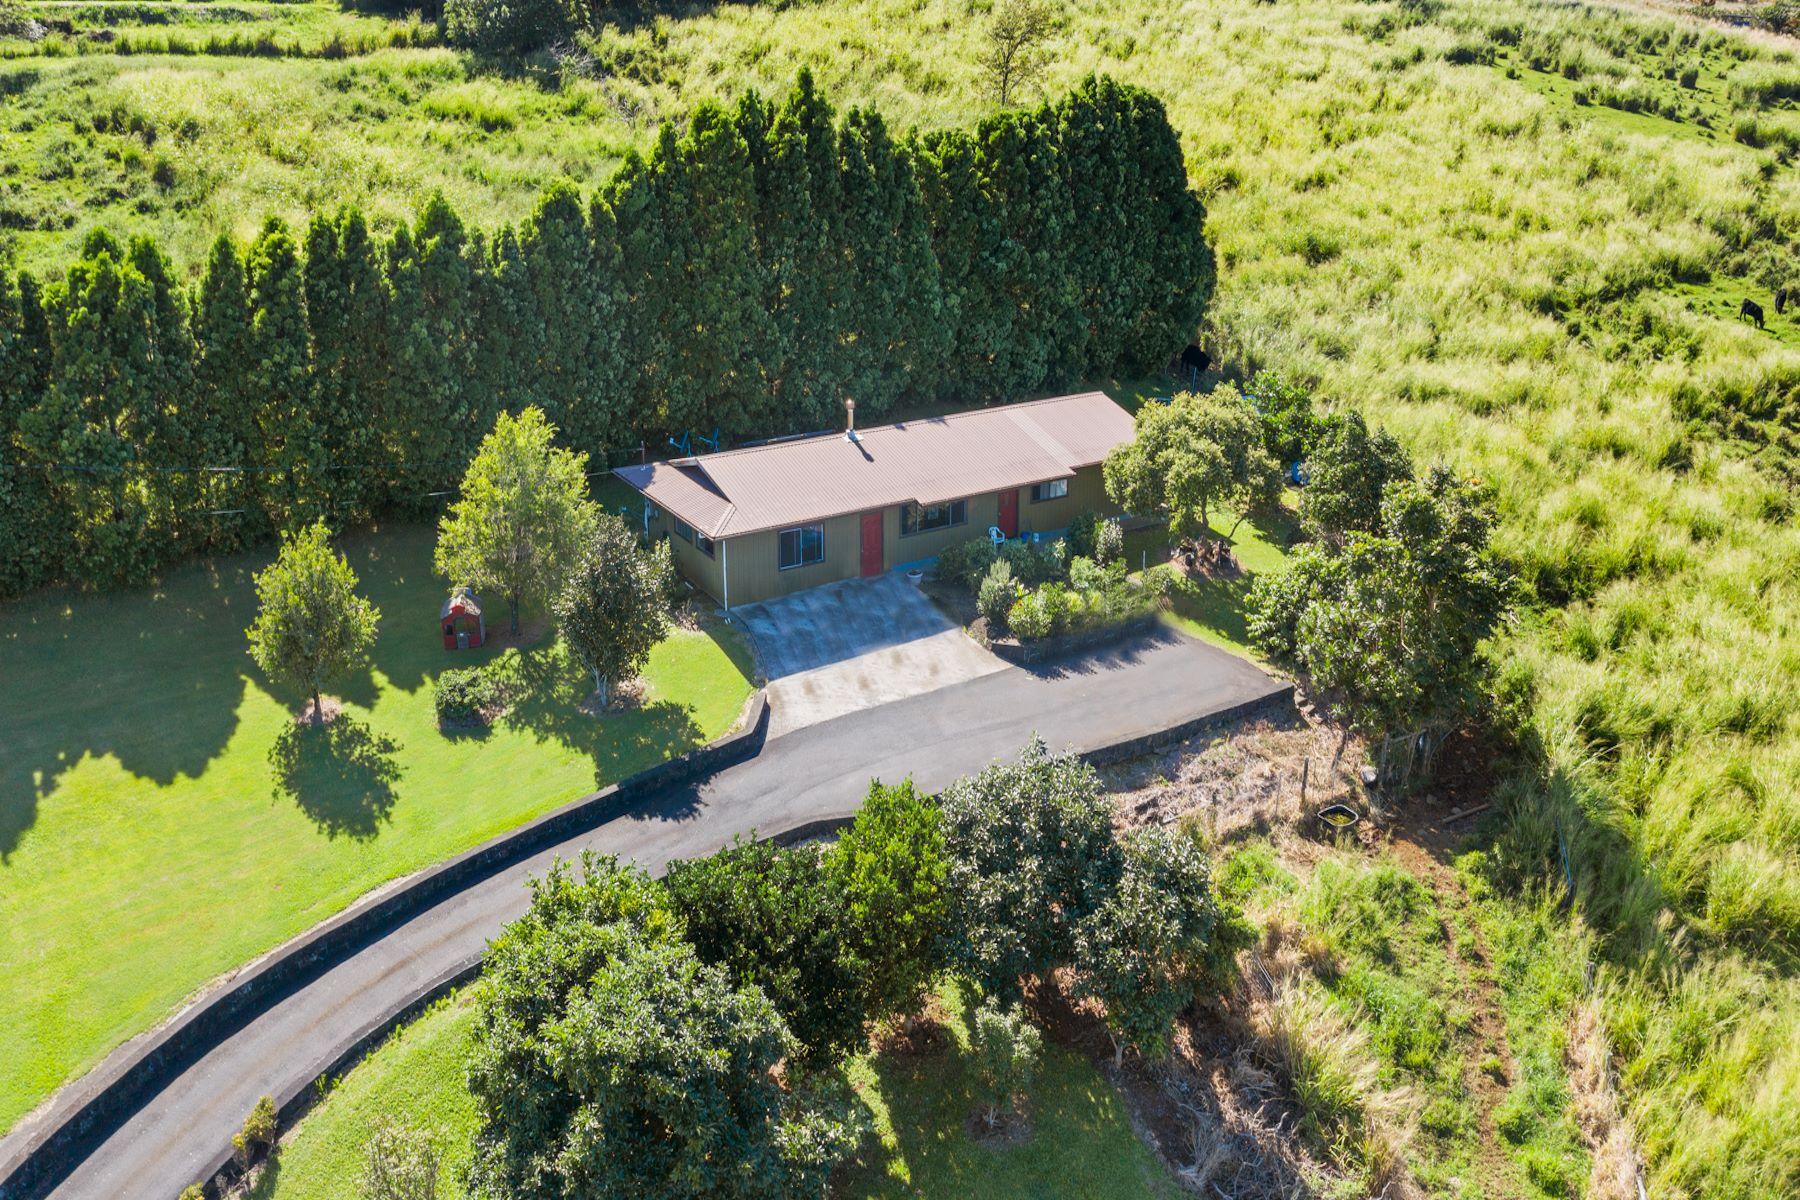 Single Family Home for Active at Kalopa Homesteads 44-2304 Kalaniai Rd. #1 Honokaa, Hawaii 96727 United States